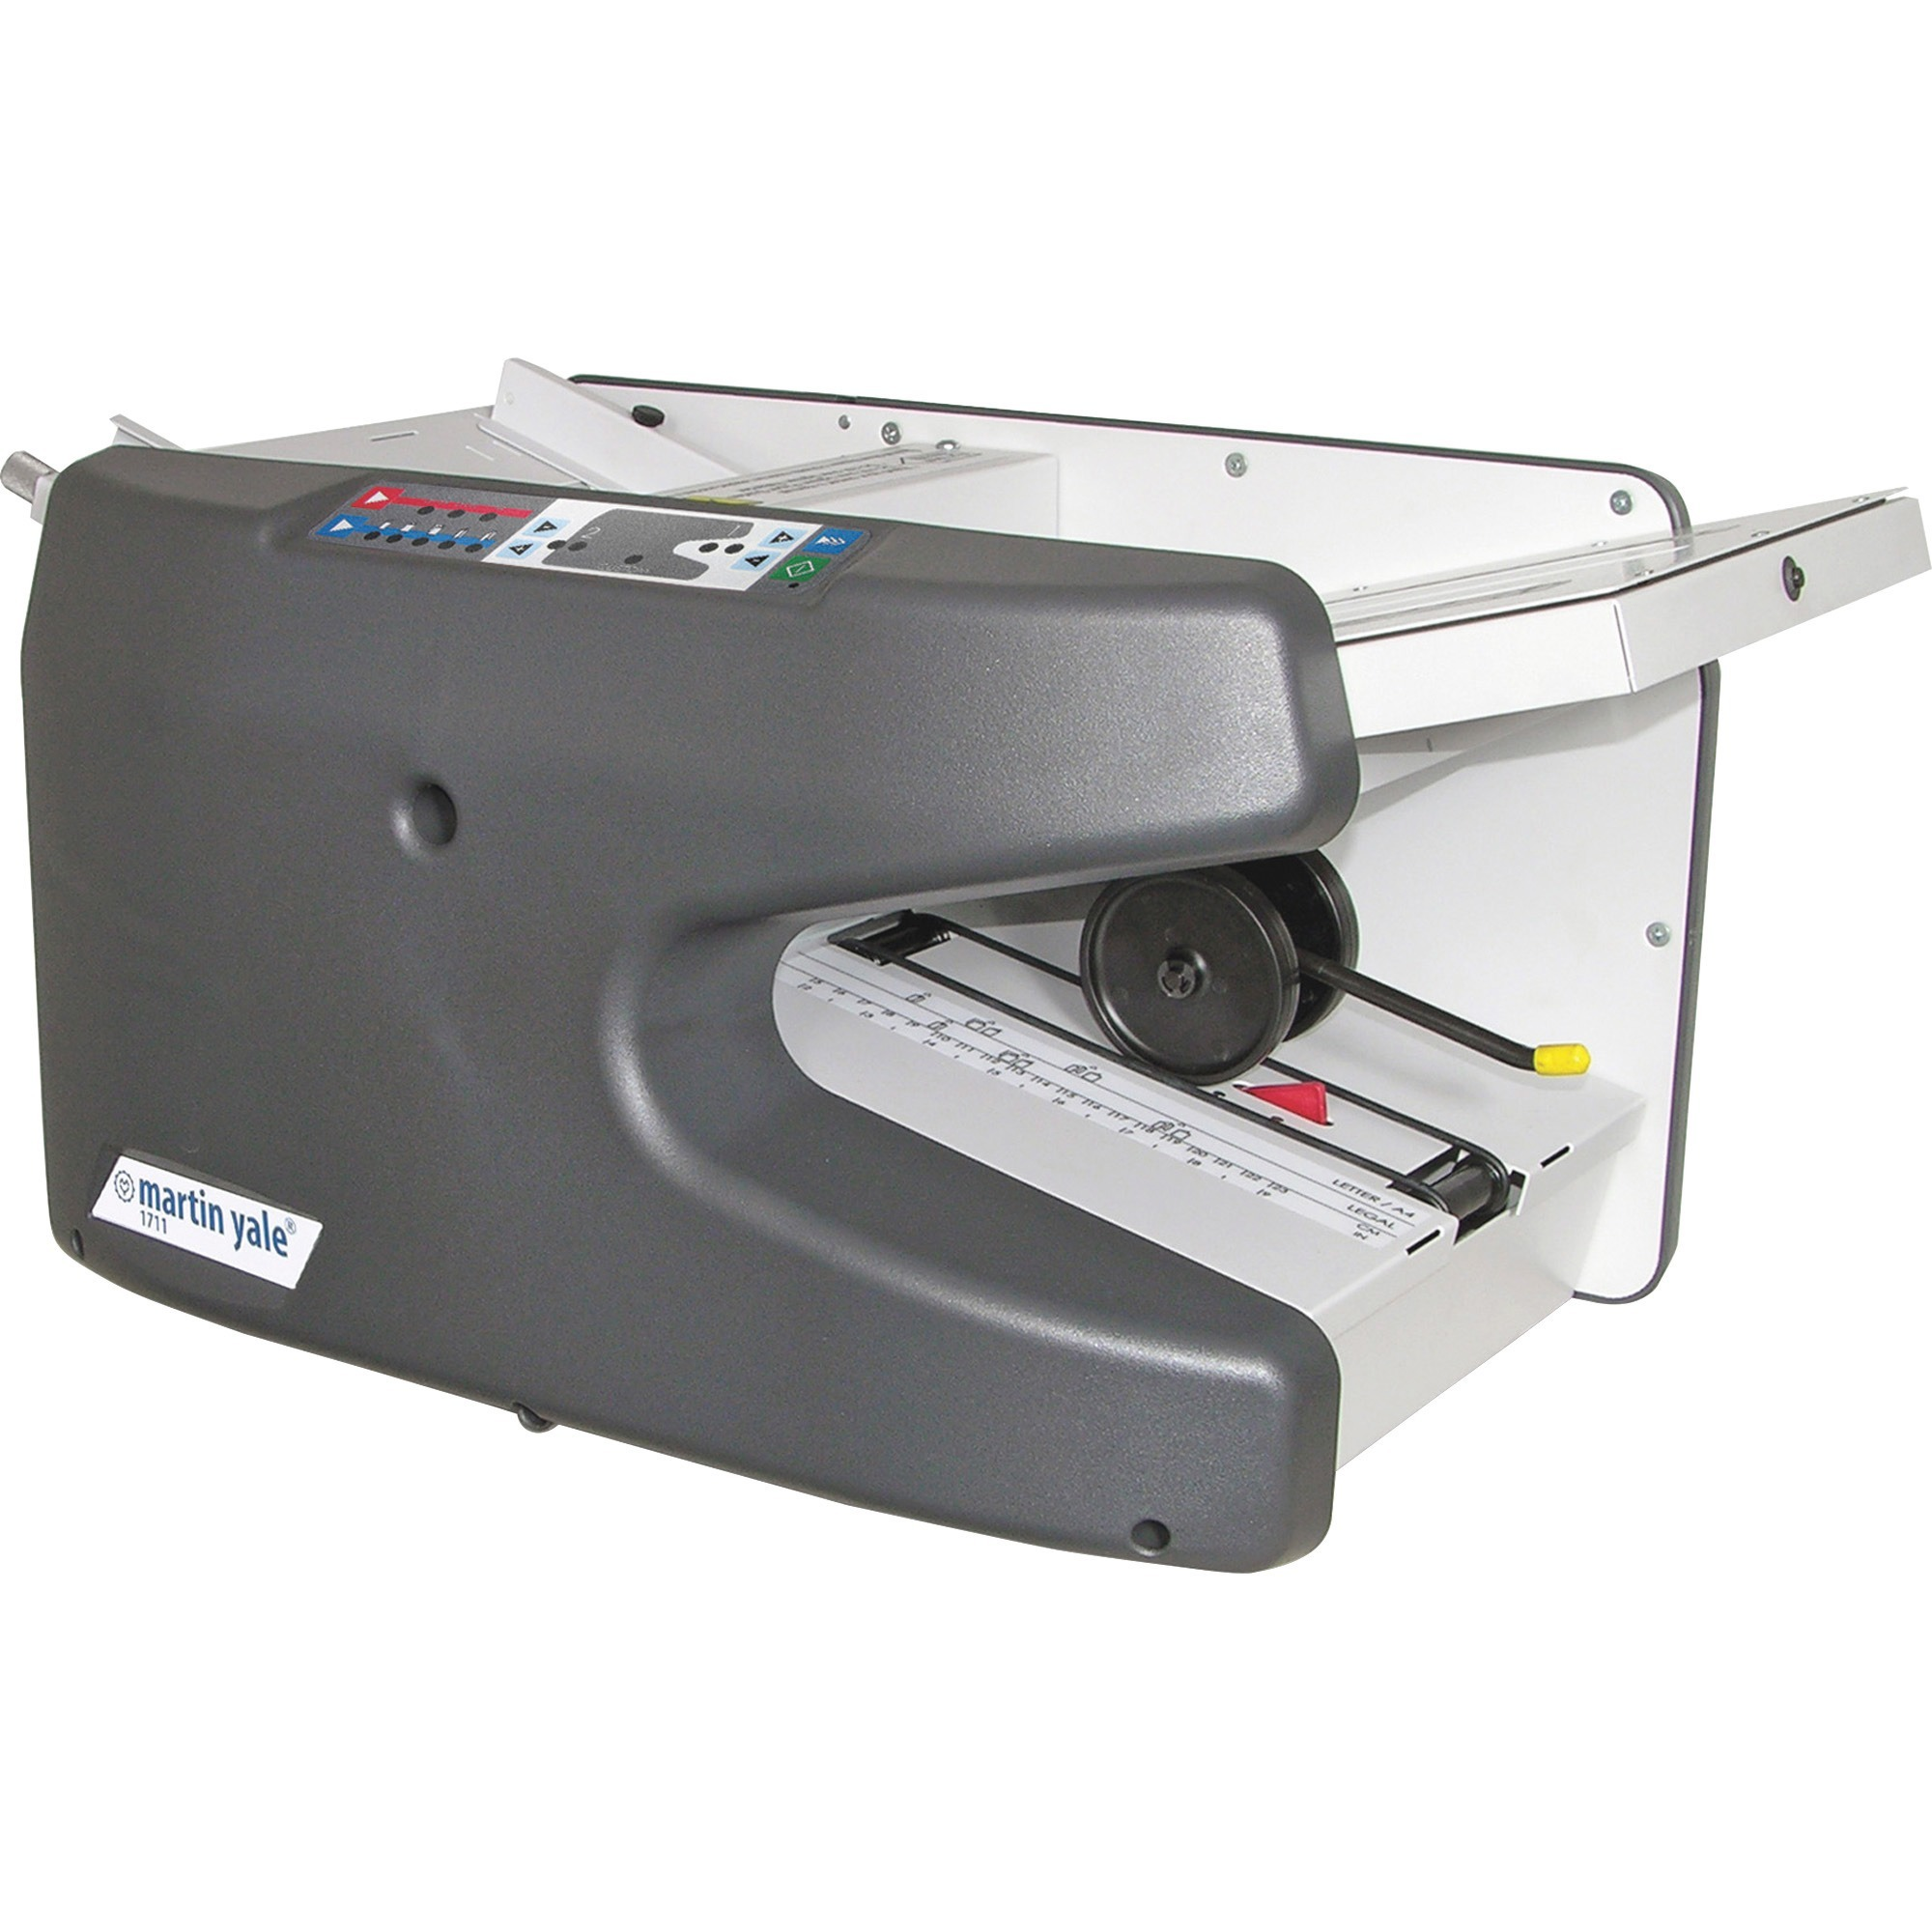 Martin Yale, PRE1711, Premier Electronic Ease-Of-Use Semi-Auto Folder, 1 Each, Charcoal